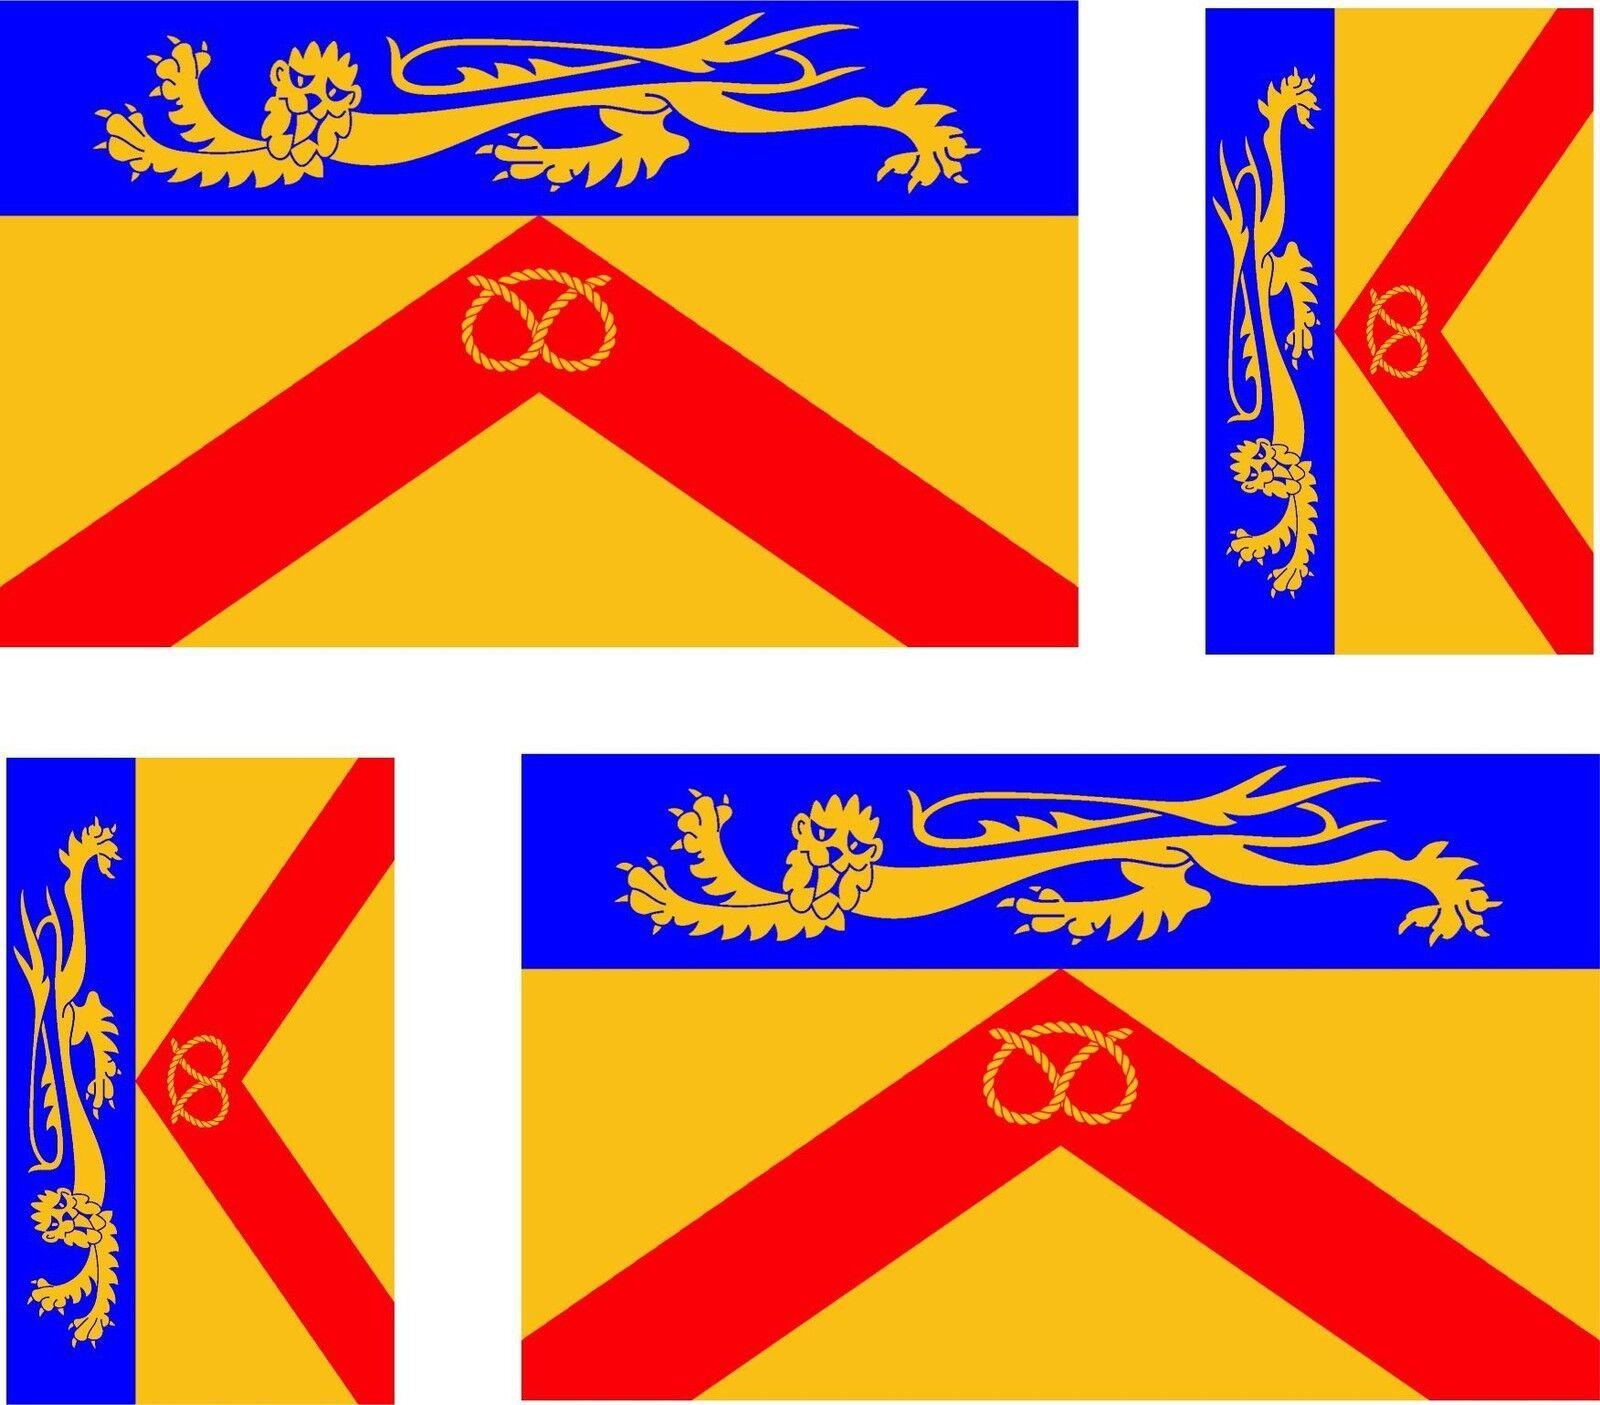 4 x sticker vinyl decal county flag uk bumper windows car moto worcestershire